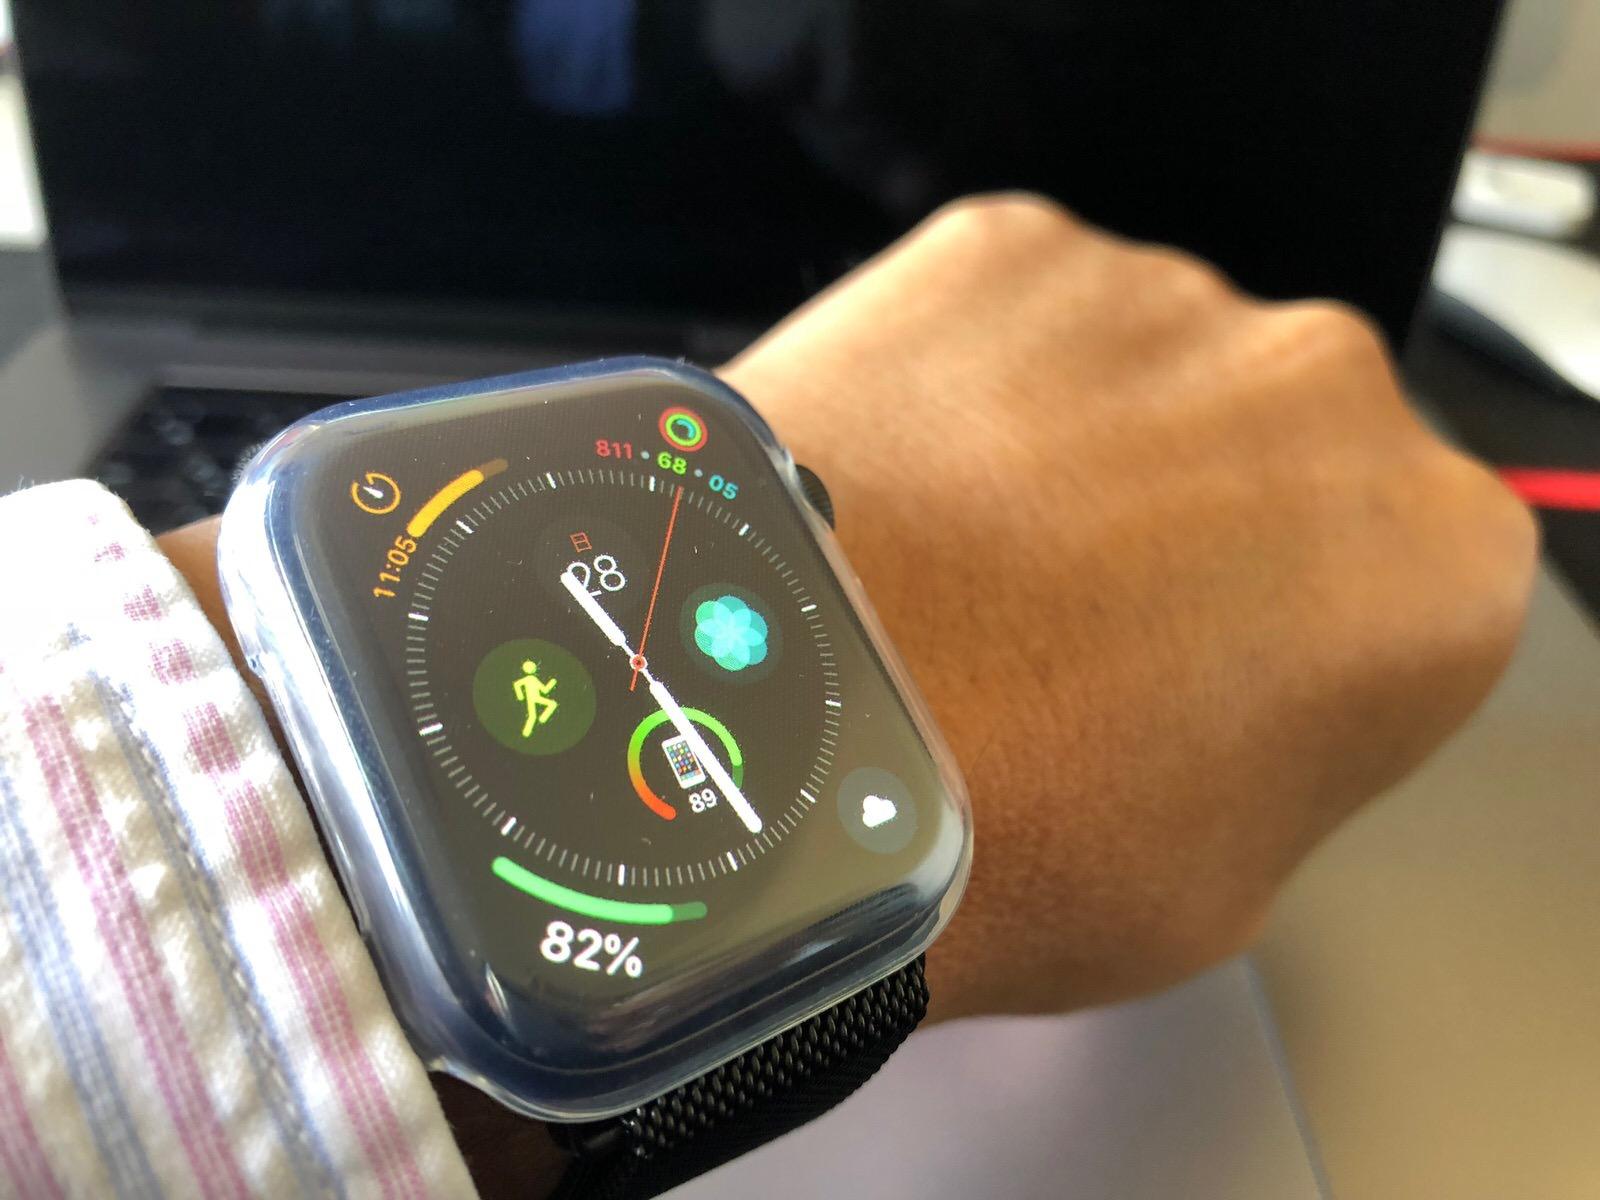 TOWOOZ【全面保護】Apple Watch 44MM ケース 透過率99% 柔軟 薄型Apple Watch Series 4 ケース-10